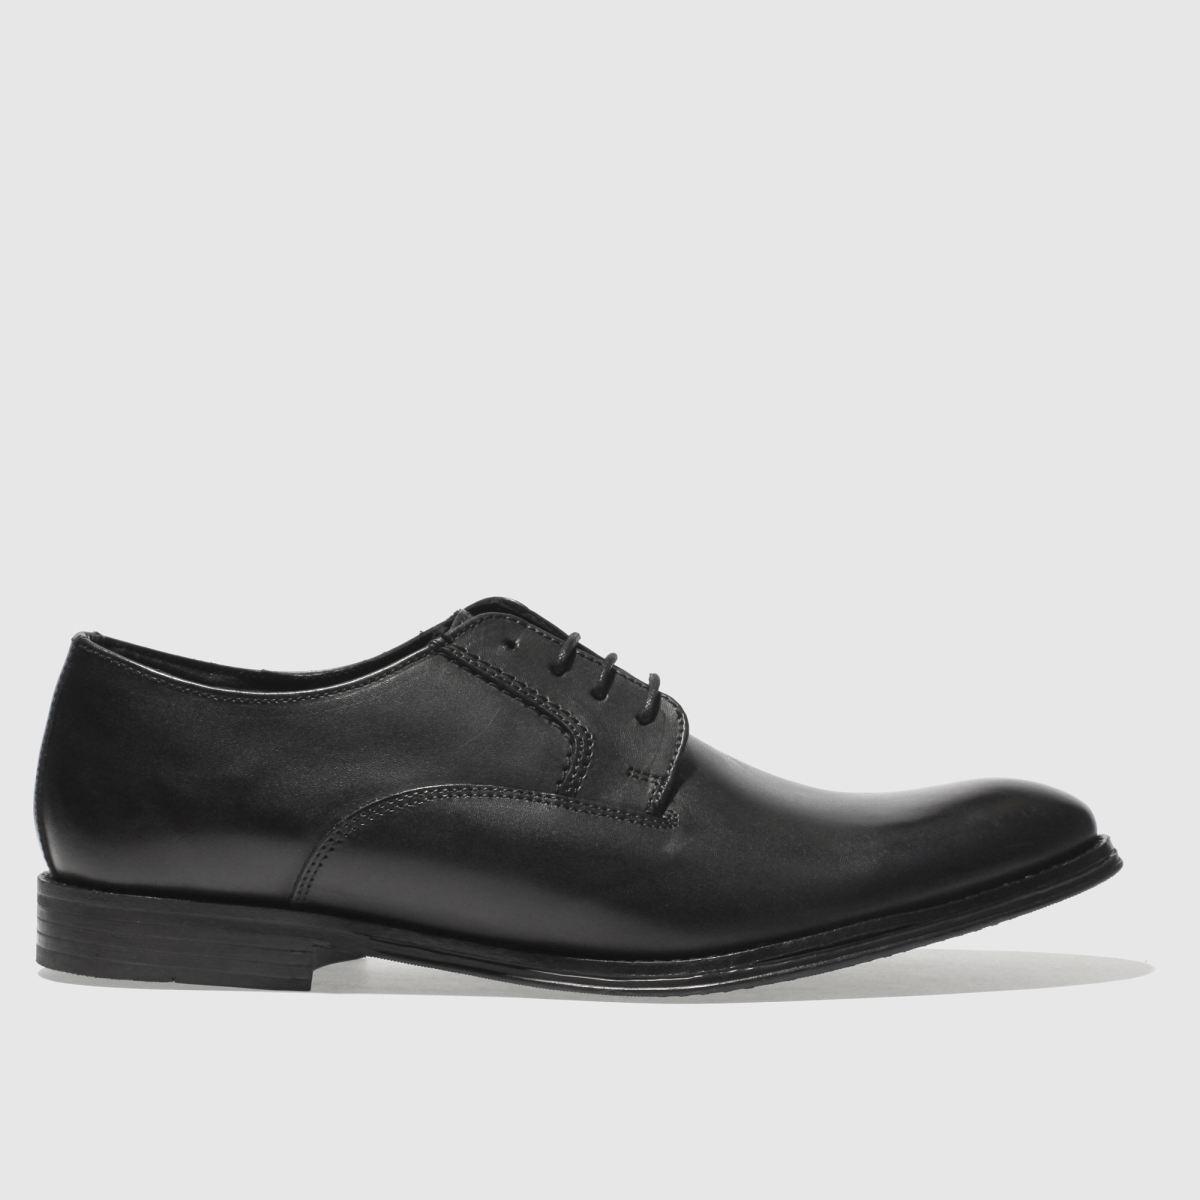 Ikon Ikon Black Poster Pt Ii Shoes